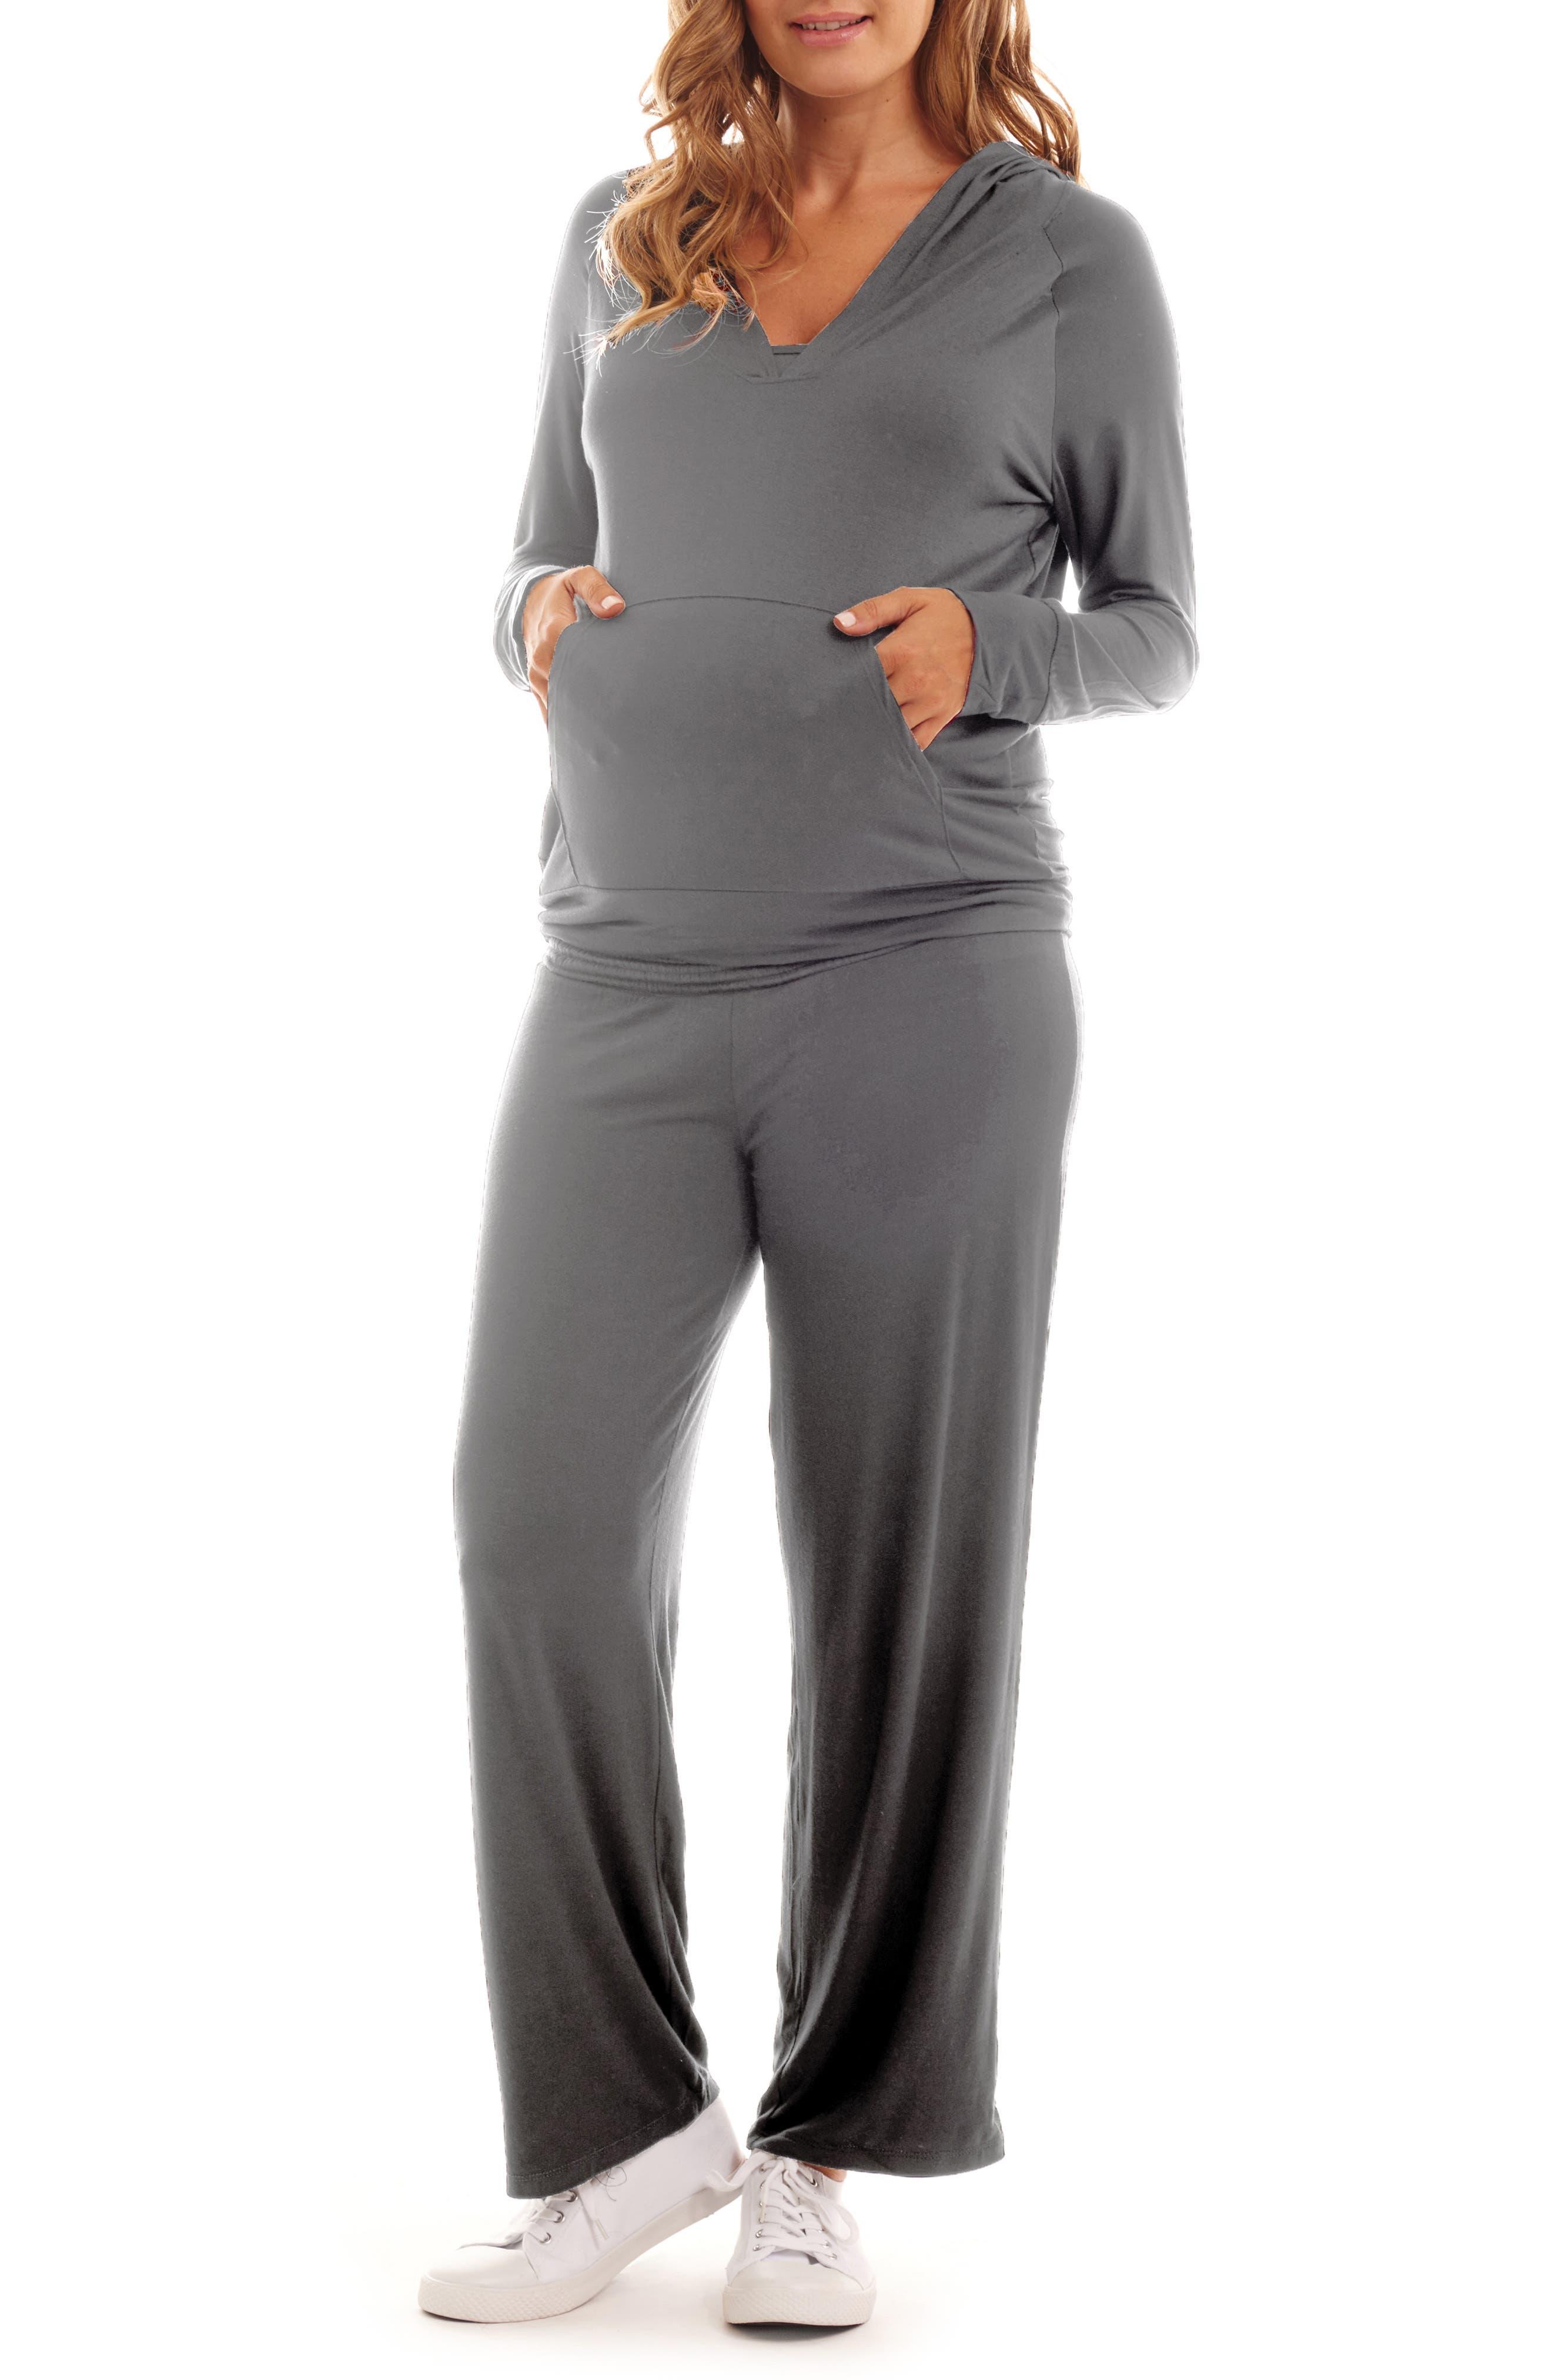 EVERLY GREY, Irene Maternity/Nursing Hoodie & Pants Set, Main thumbnail 1, color, CHARCOAL